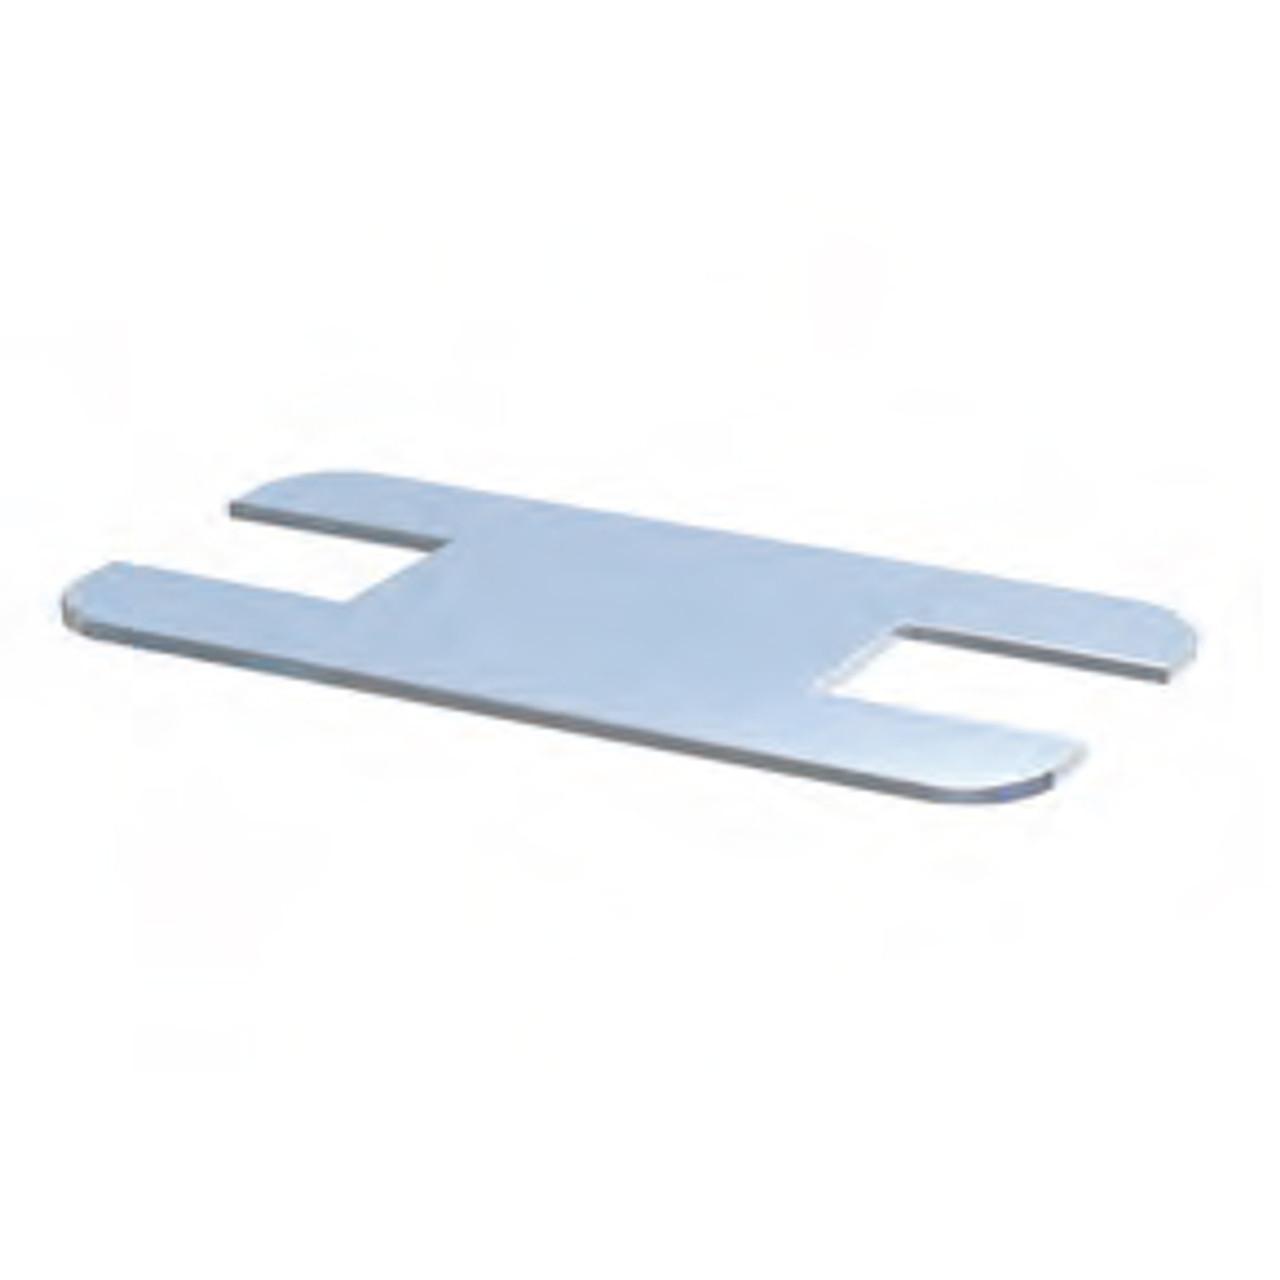 LP3316 Locking Plate